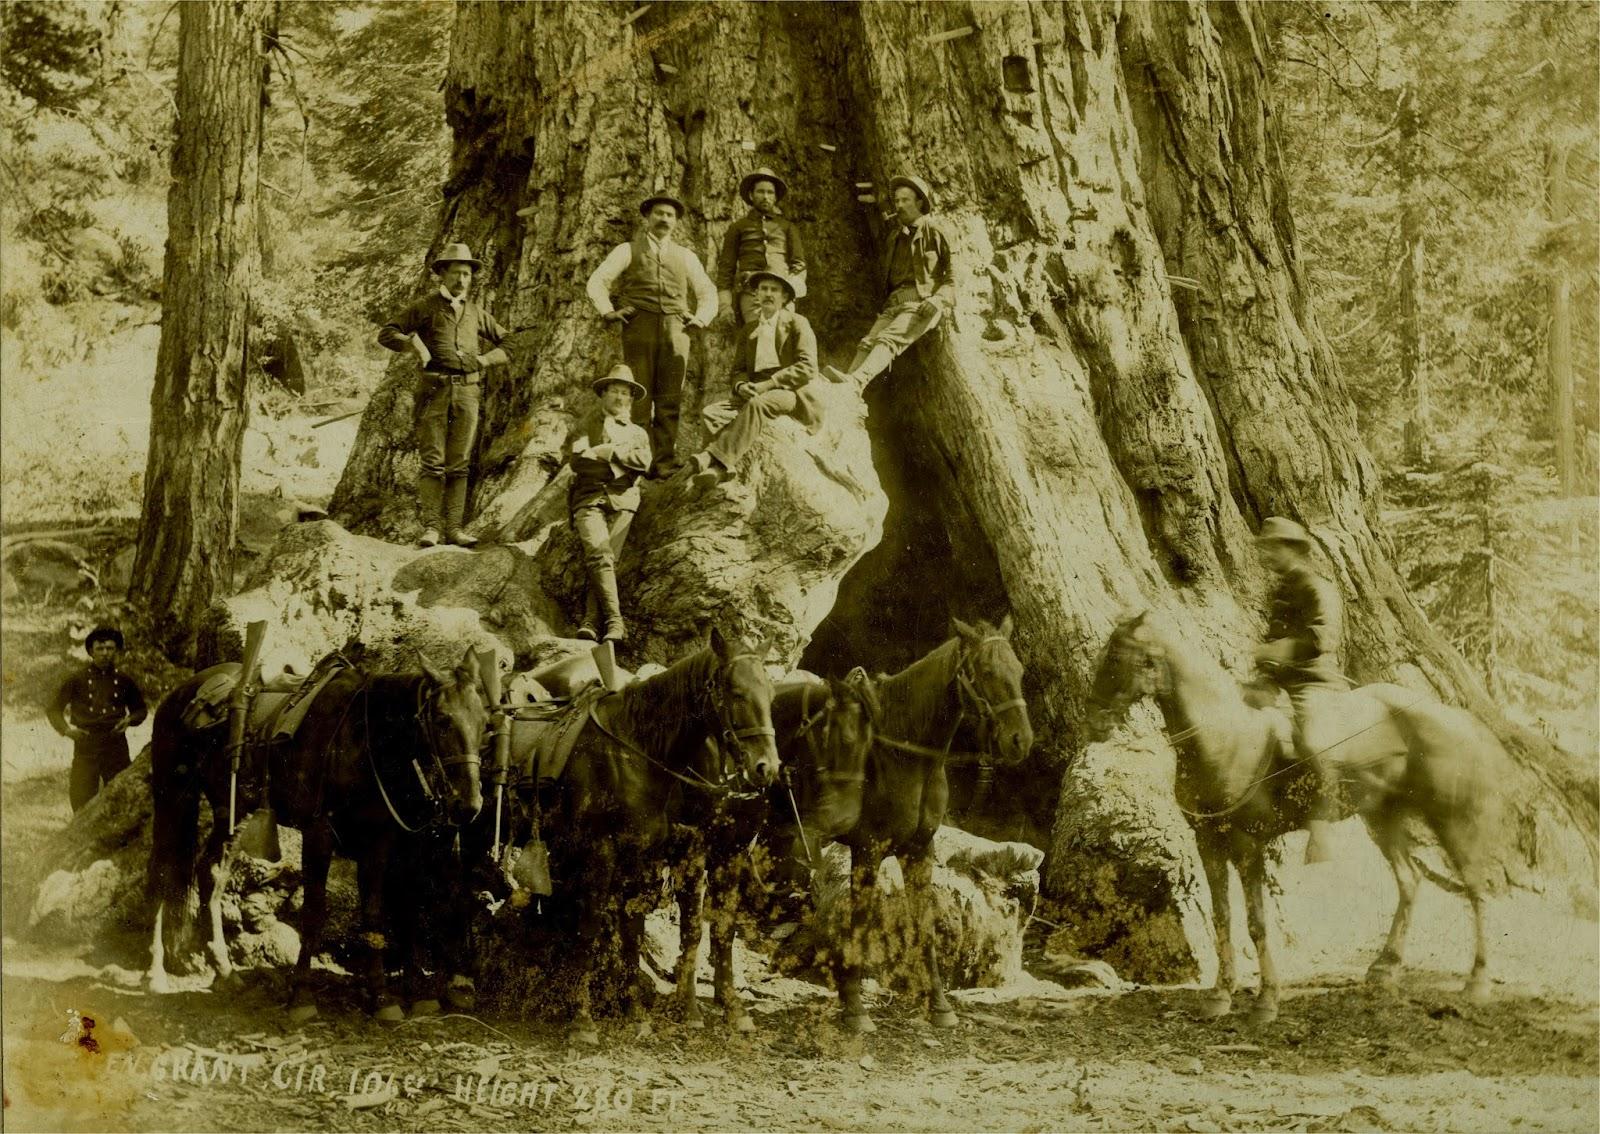 cavalrymen  ...R C Moore Lumber Company